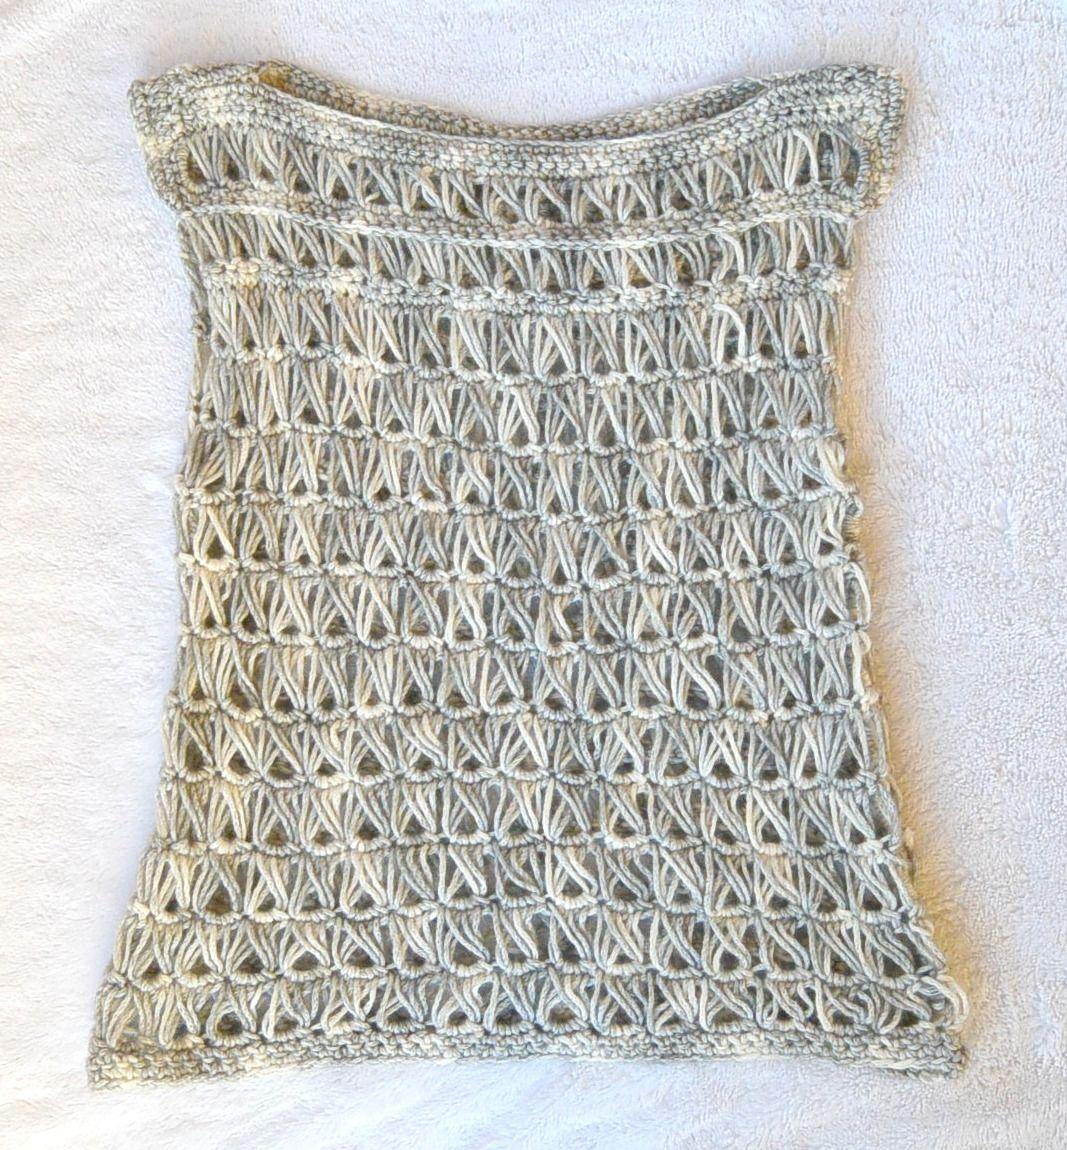 Broomstick Lace Crochet Top | Crochet summer tops, Crochet summer ...